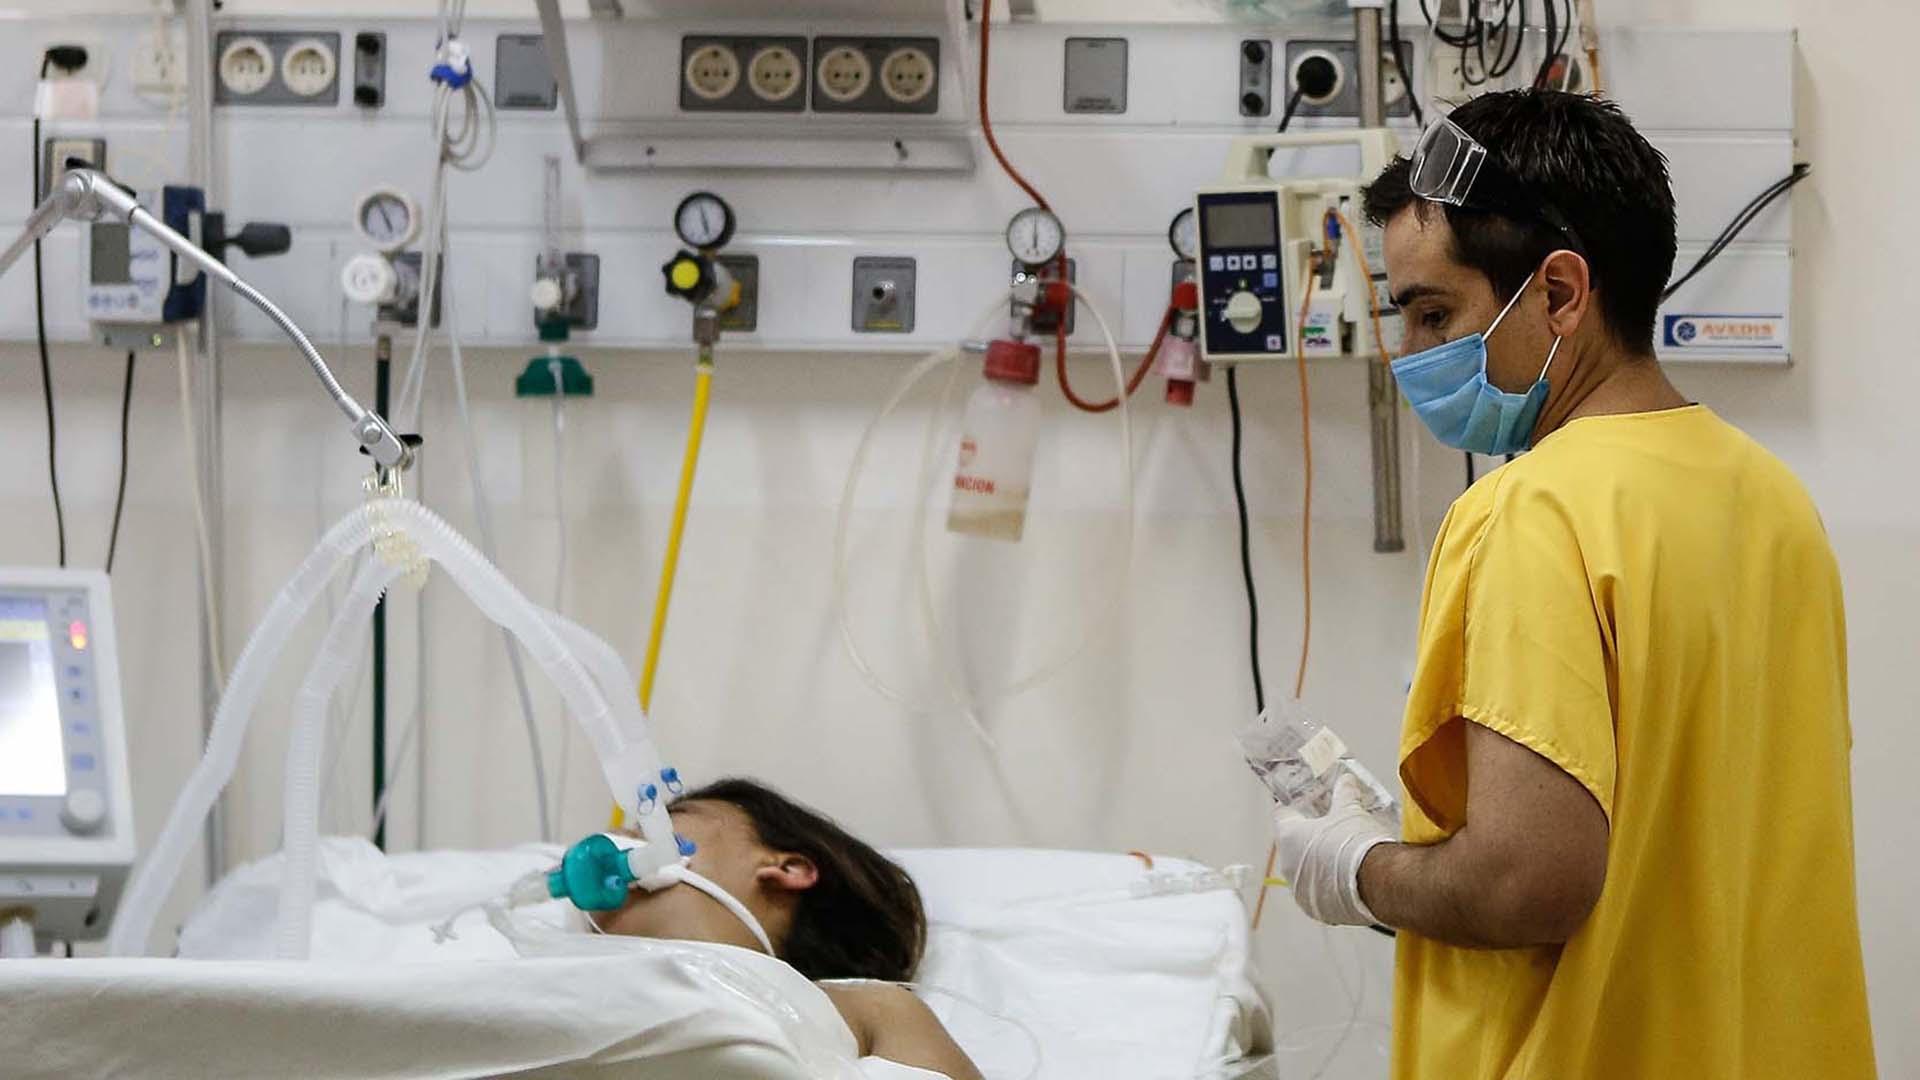 Una enfermera prepara una jeringuilla. EFE/EPA/HOTLI SIMANJUNTAK